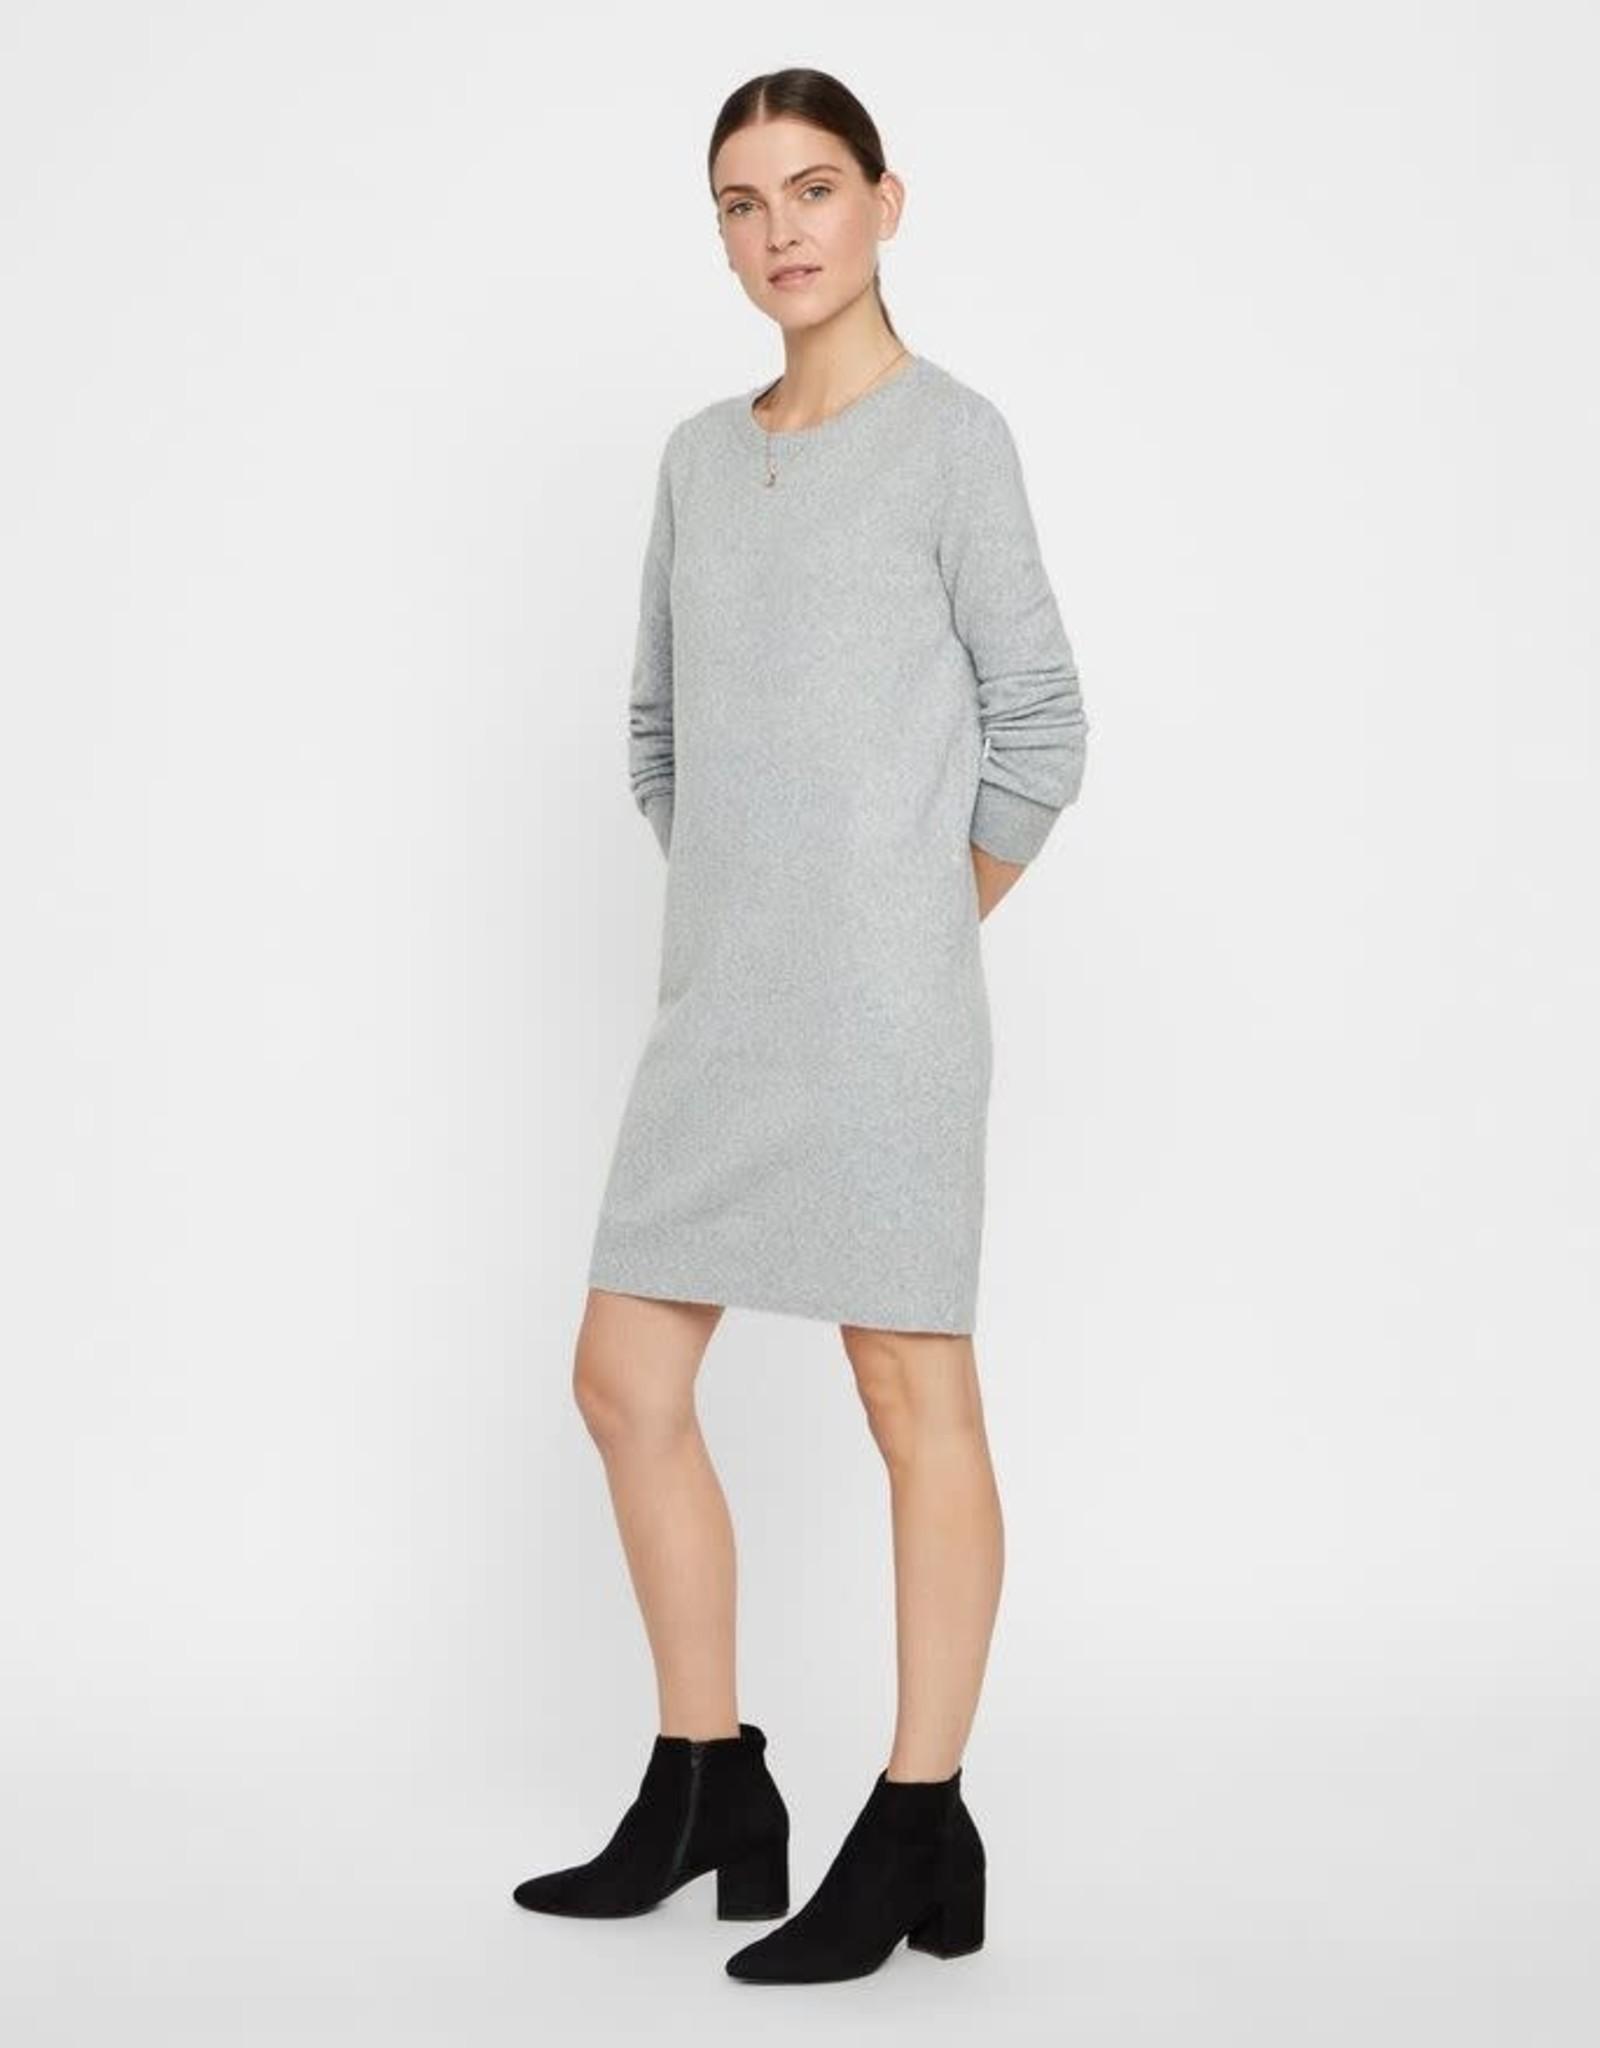 VERA MODA DOFFY Knit Dress